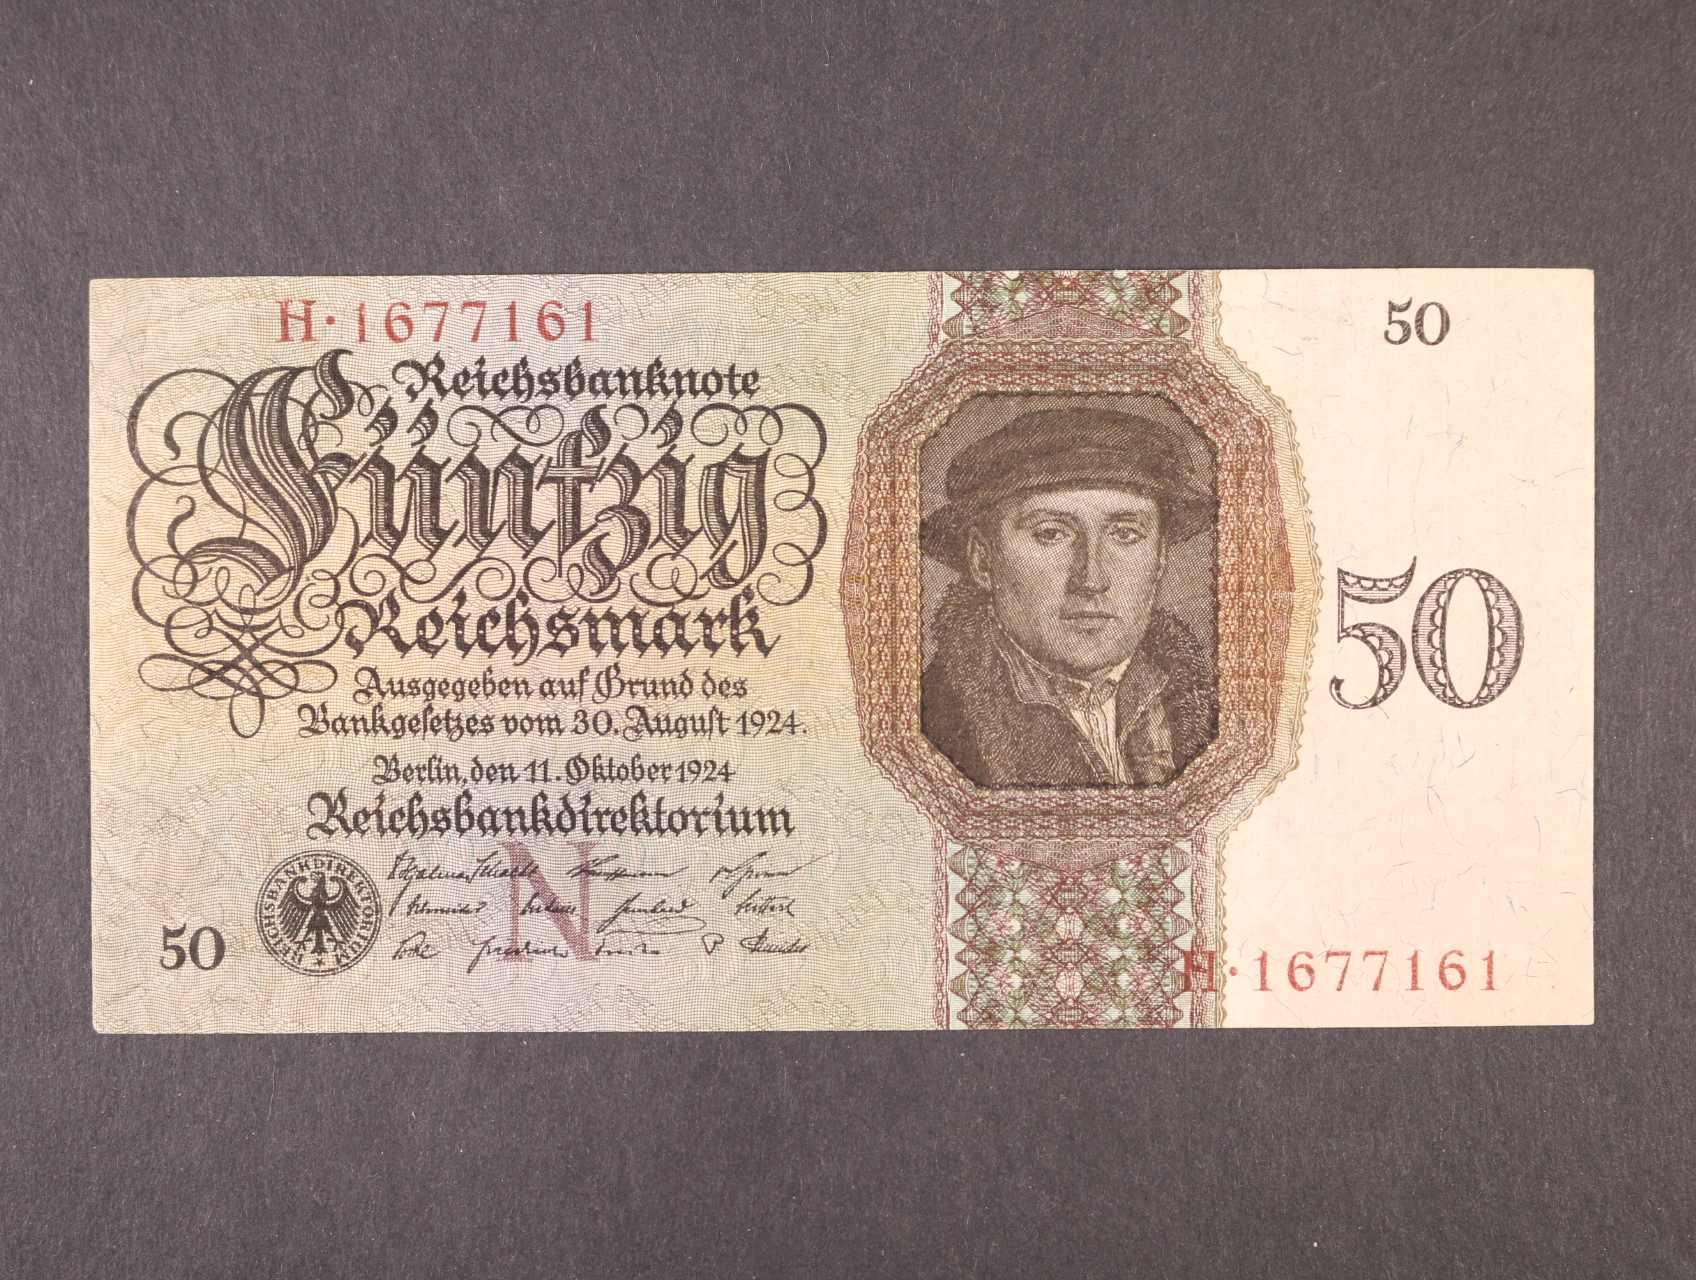 50 RM 11.10.1924 série H, podtisk. písmeno N, platná na ČS území, Ro. 170a, Ba. D5